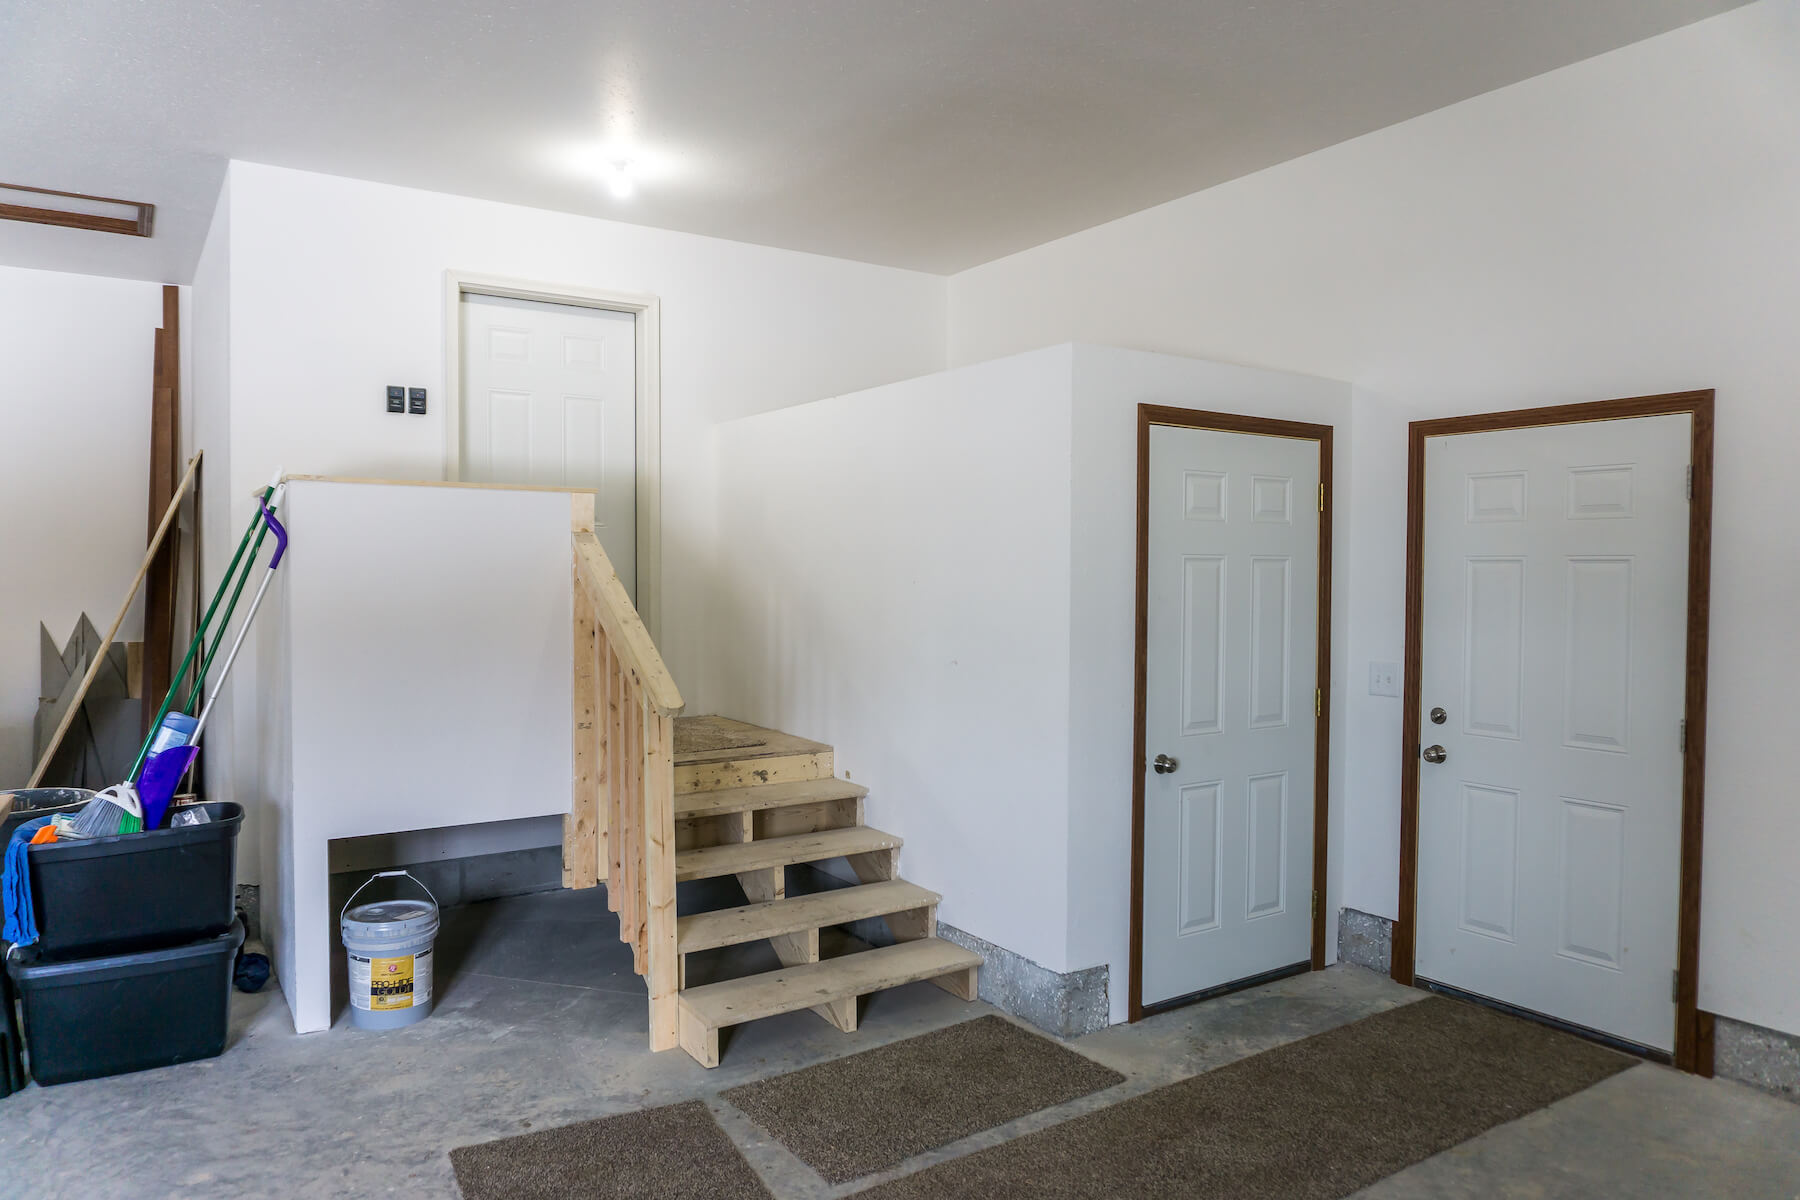 2019-4-12 Kemper Avenue Builders FirstSource Compressed  38.jpg